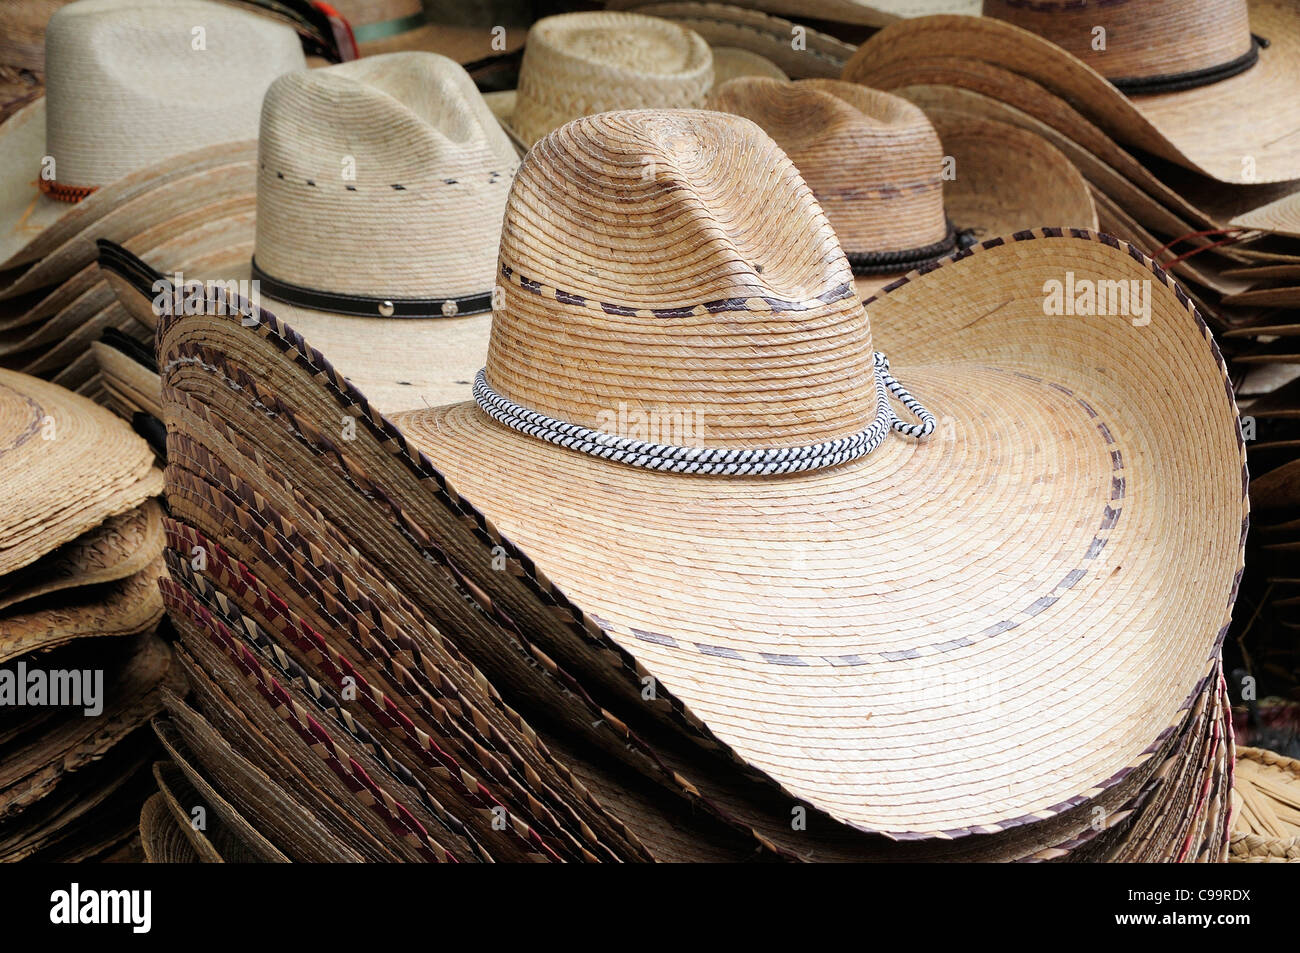 Mexico Straw Hats Mexican Imágenes De Stock   Mexico Straw Hats ... 0ce7f9e2725